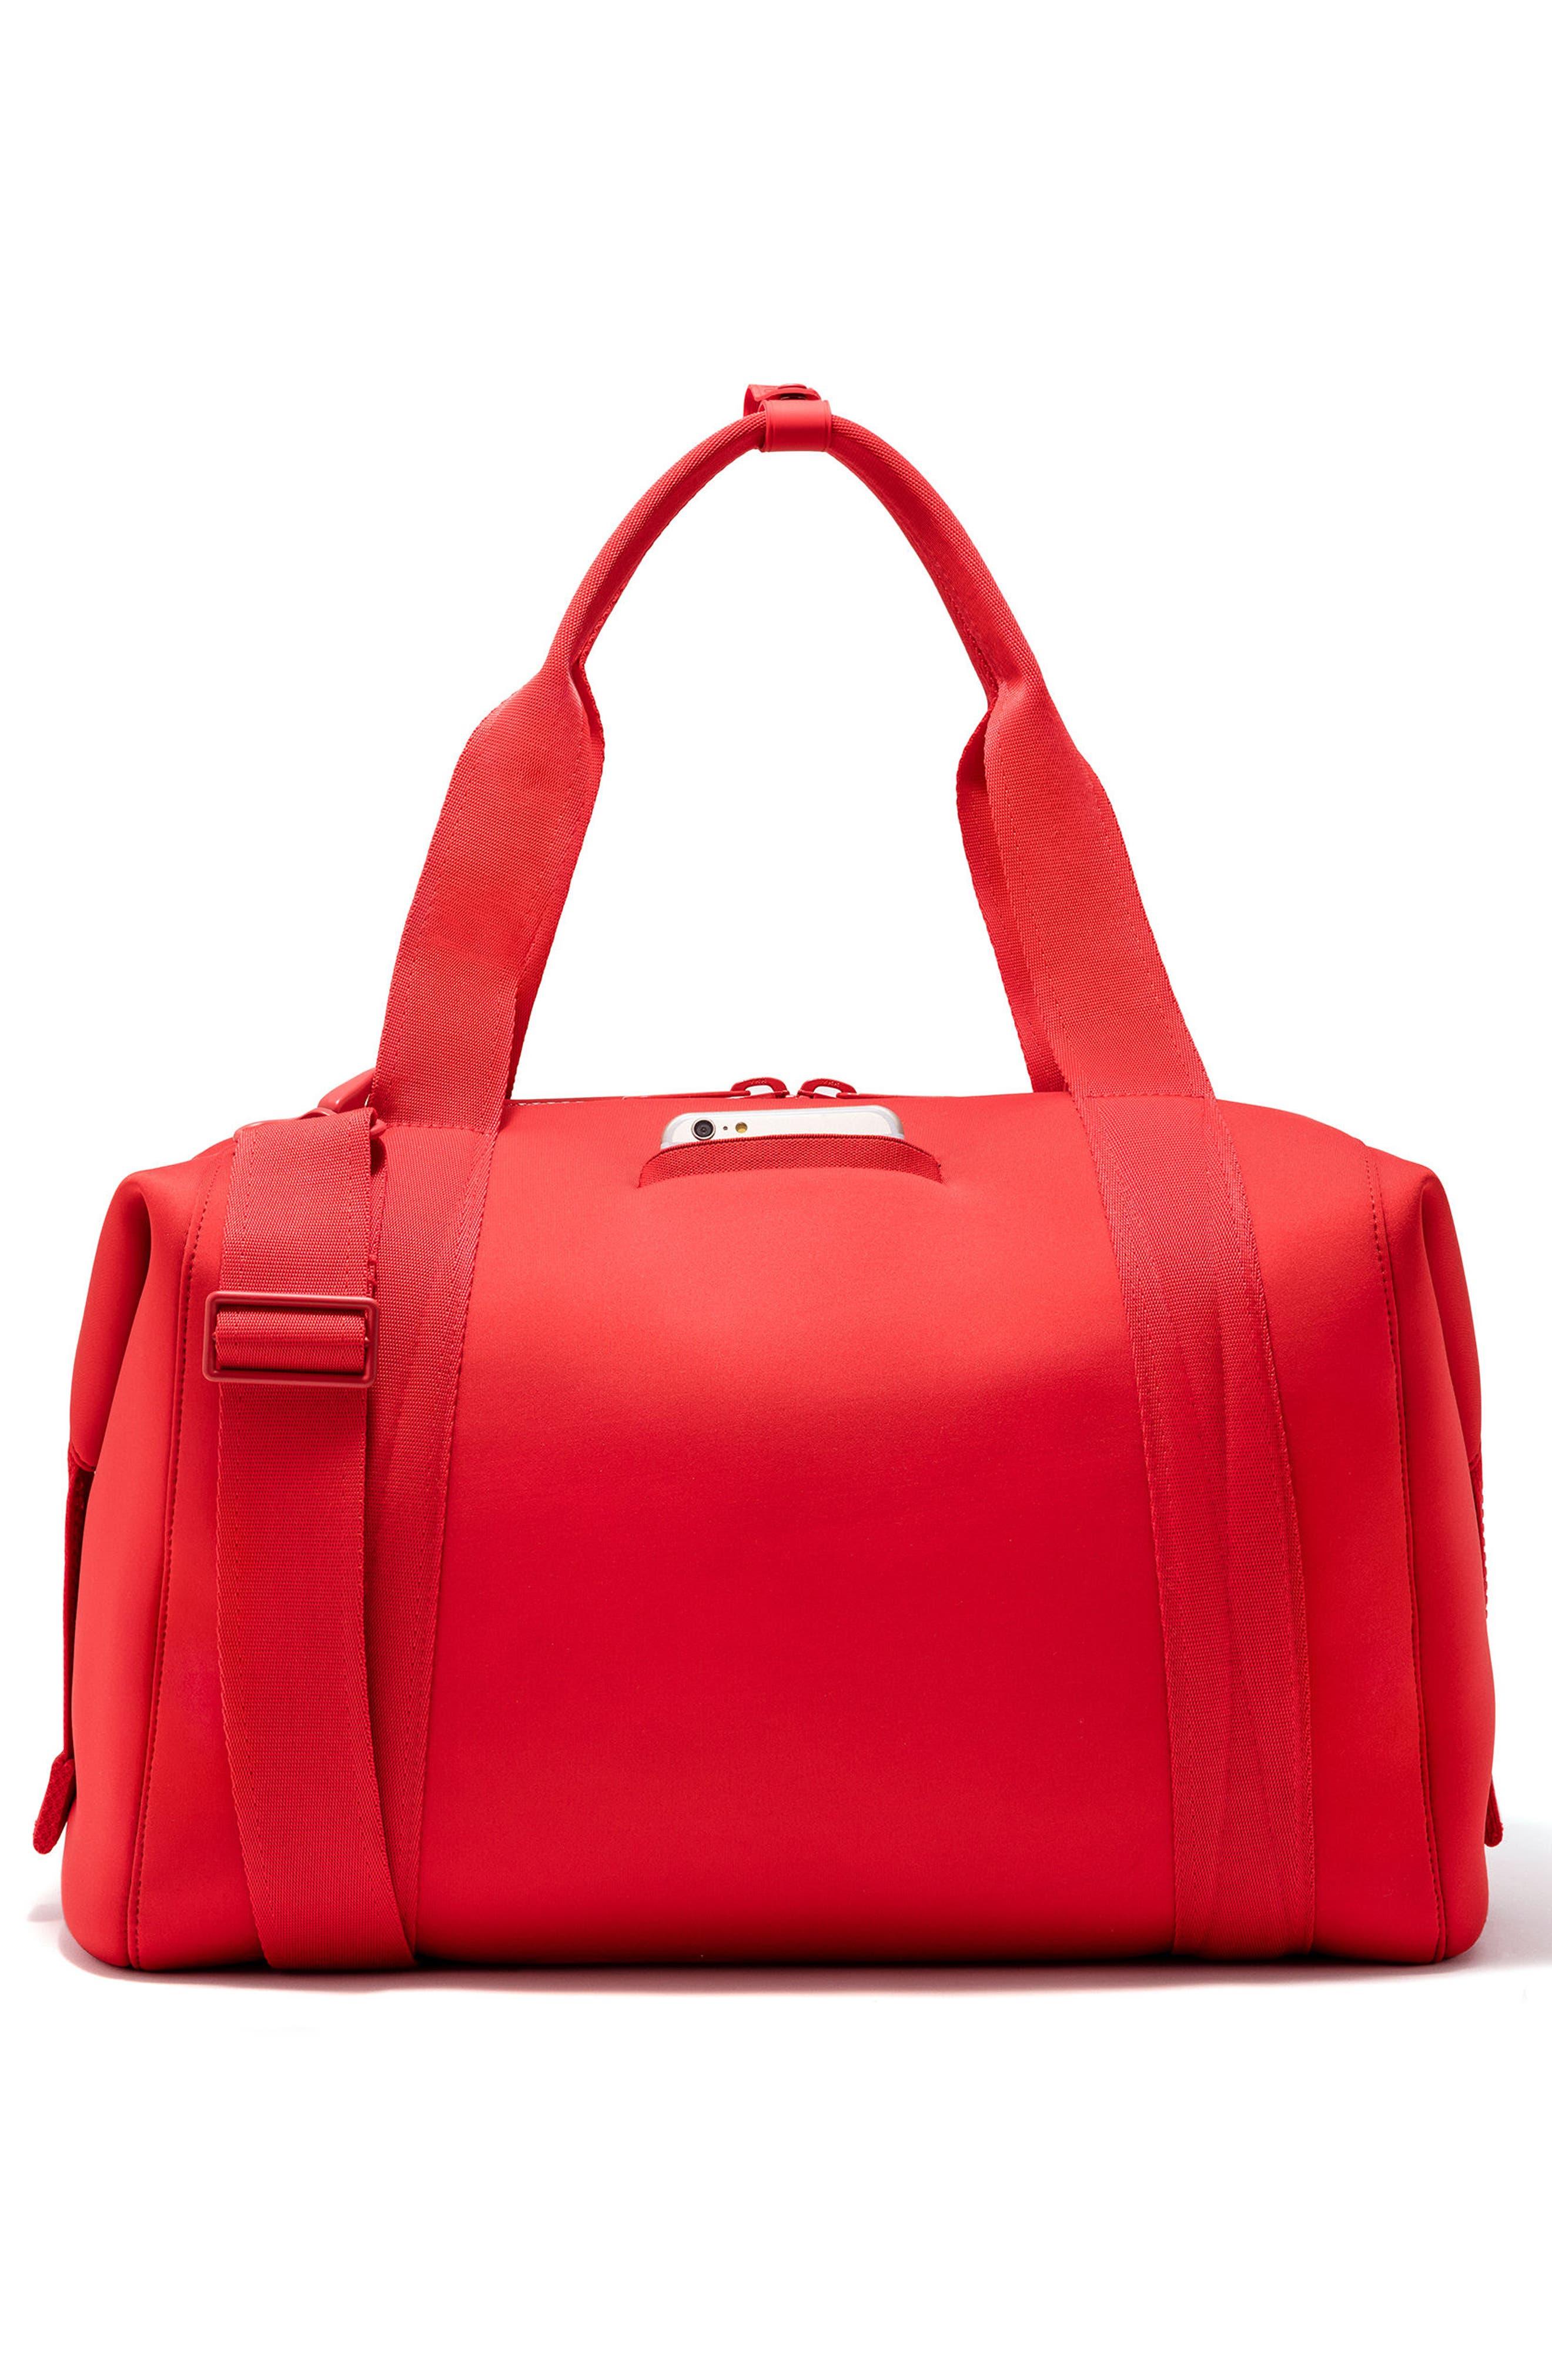 365 Large Landon Neoprene Carryall Duffel Bag,                             Alternate thumbnail 34, color,